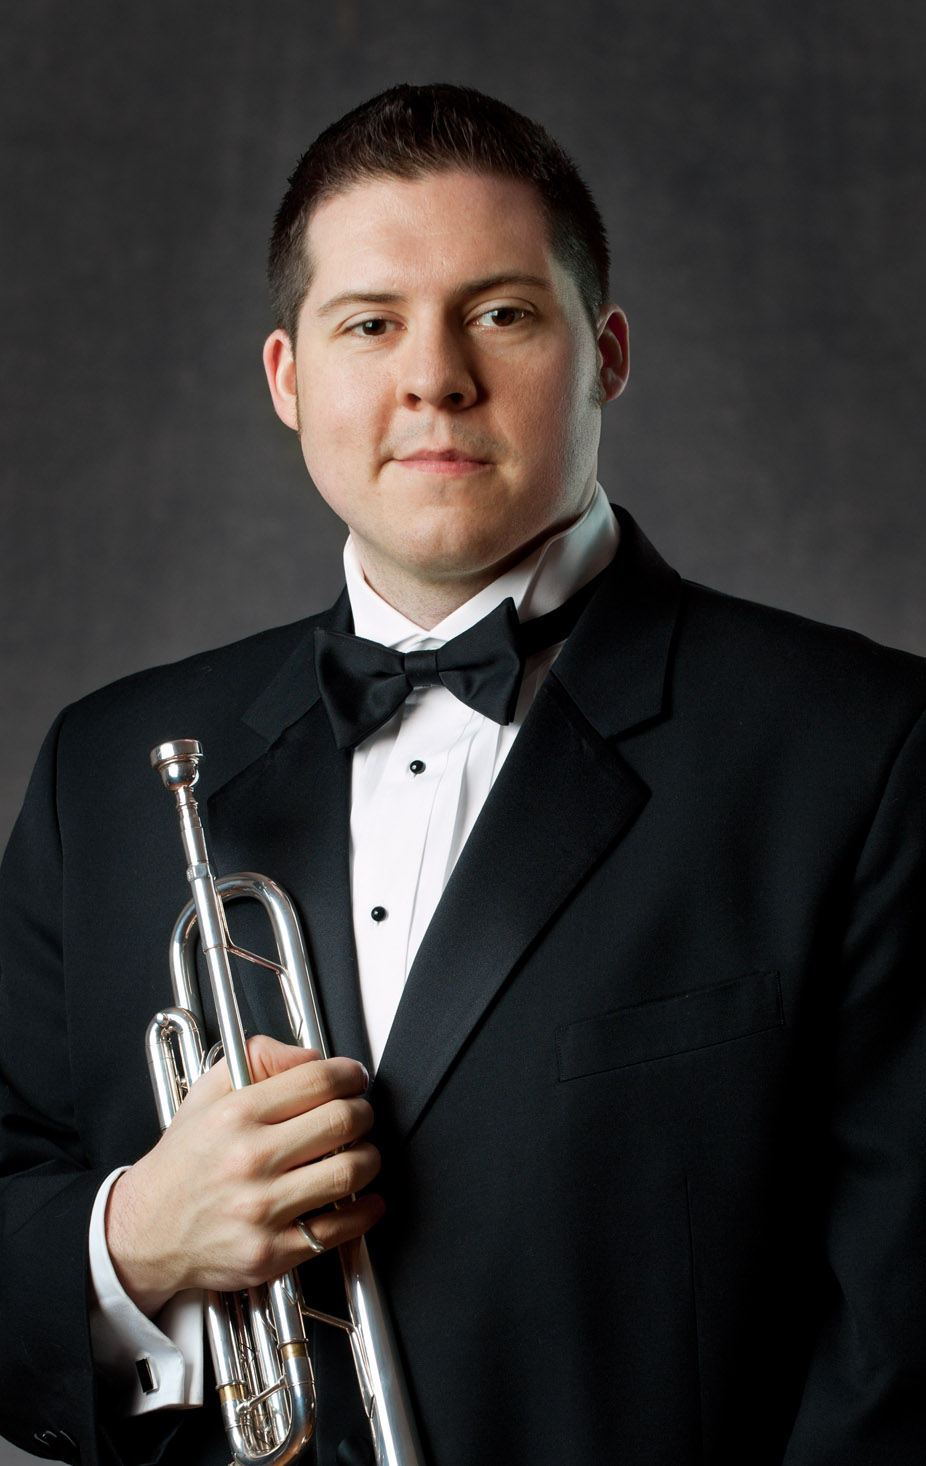 Trumpet, Thomas Boulton, Principal